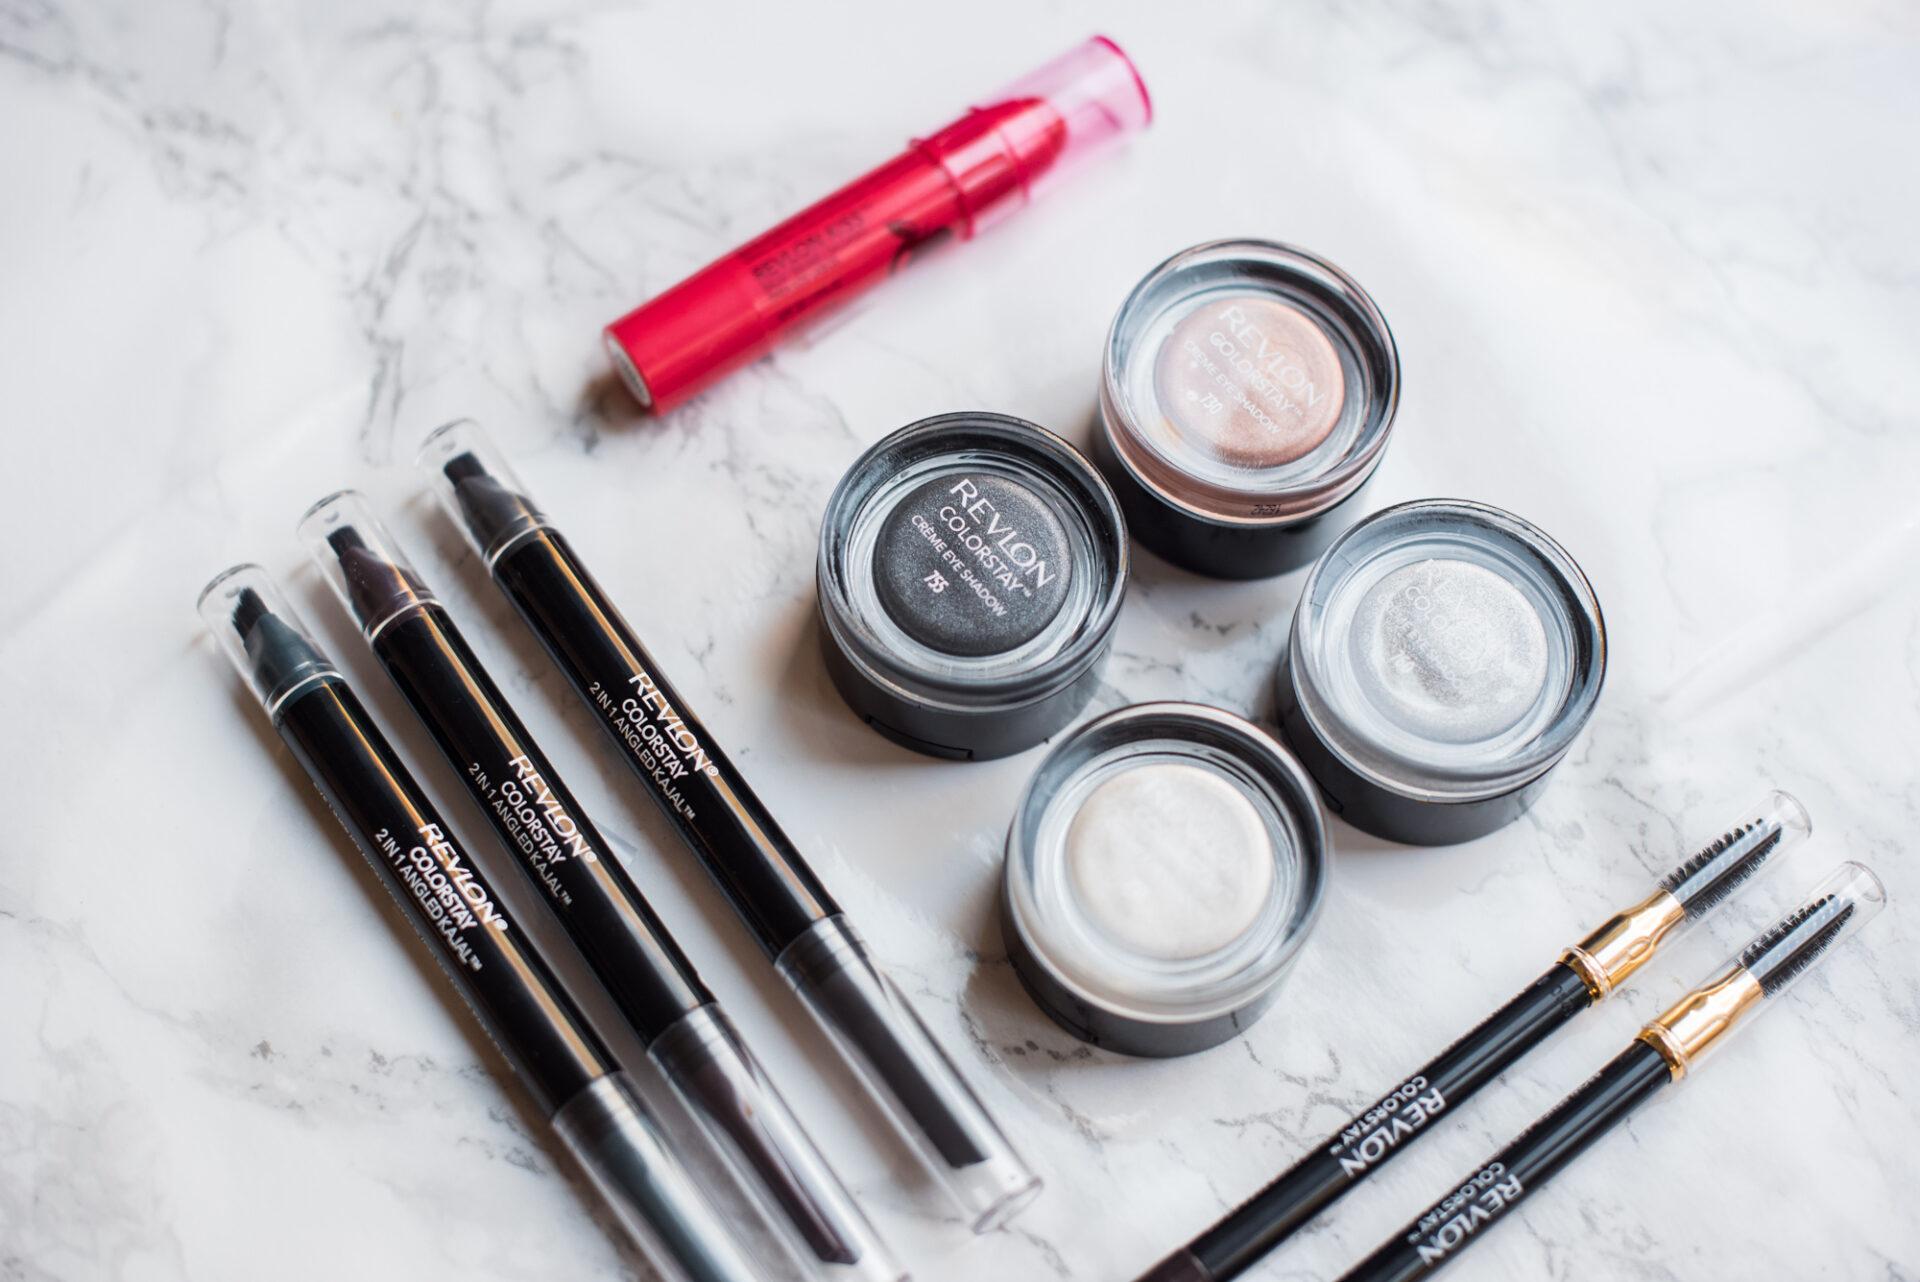 Revlon Colorstay eye collection review tutorial    Fashion styles for women    angela lanter hello gorgeous